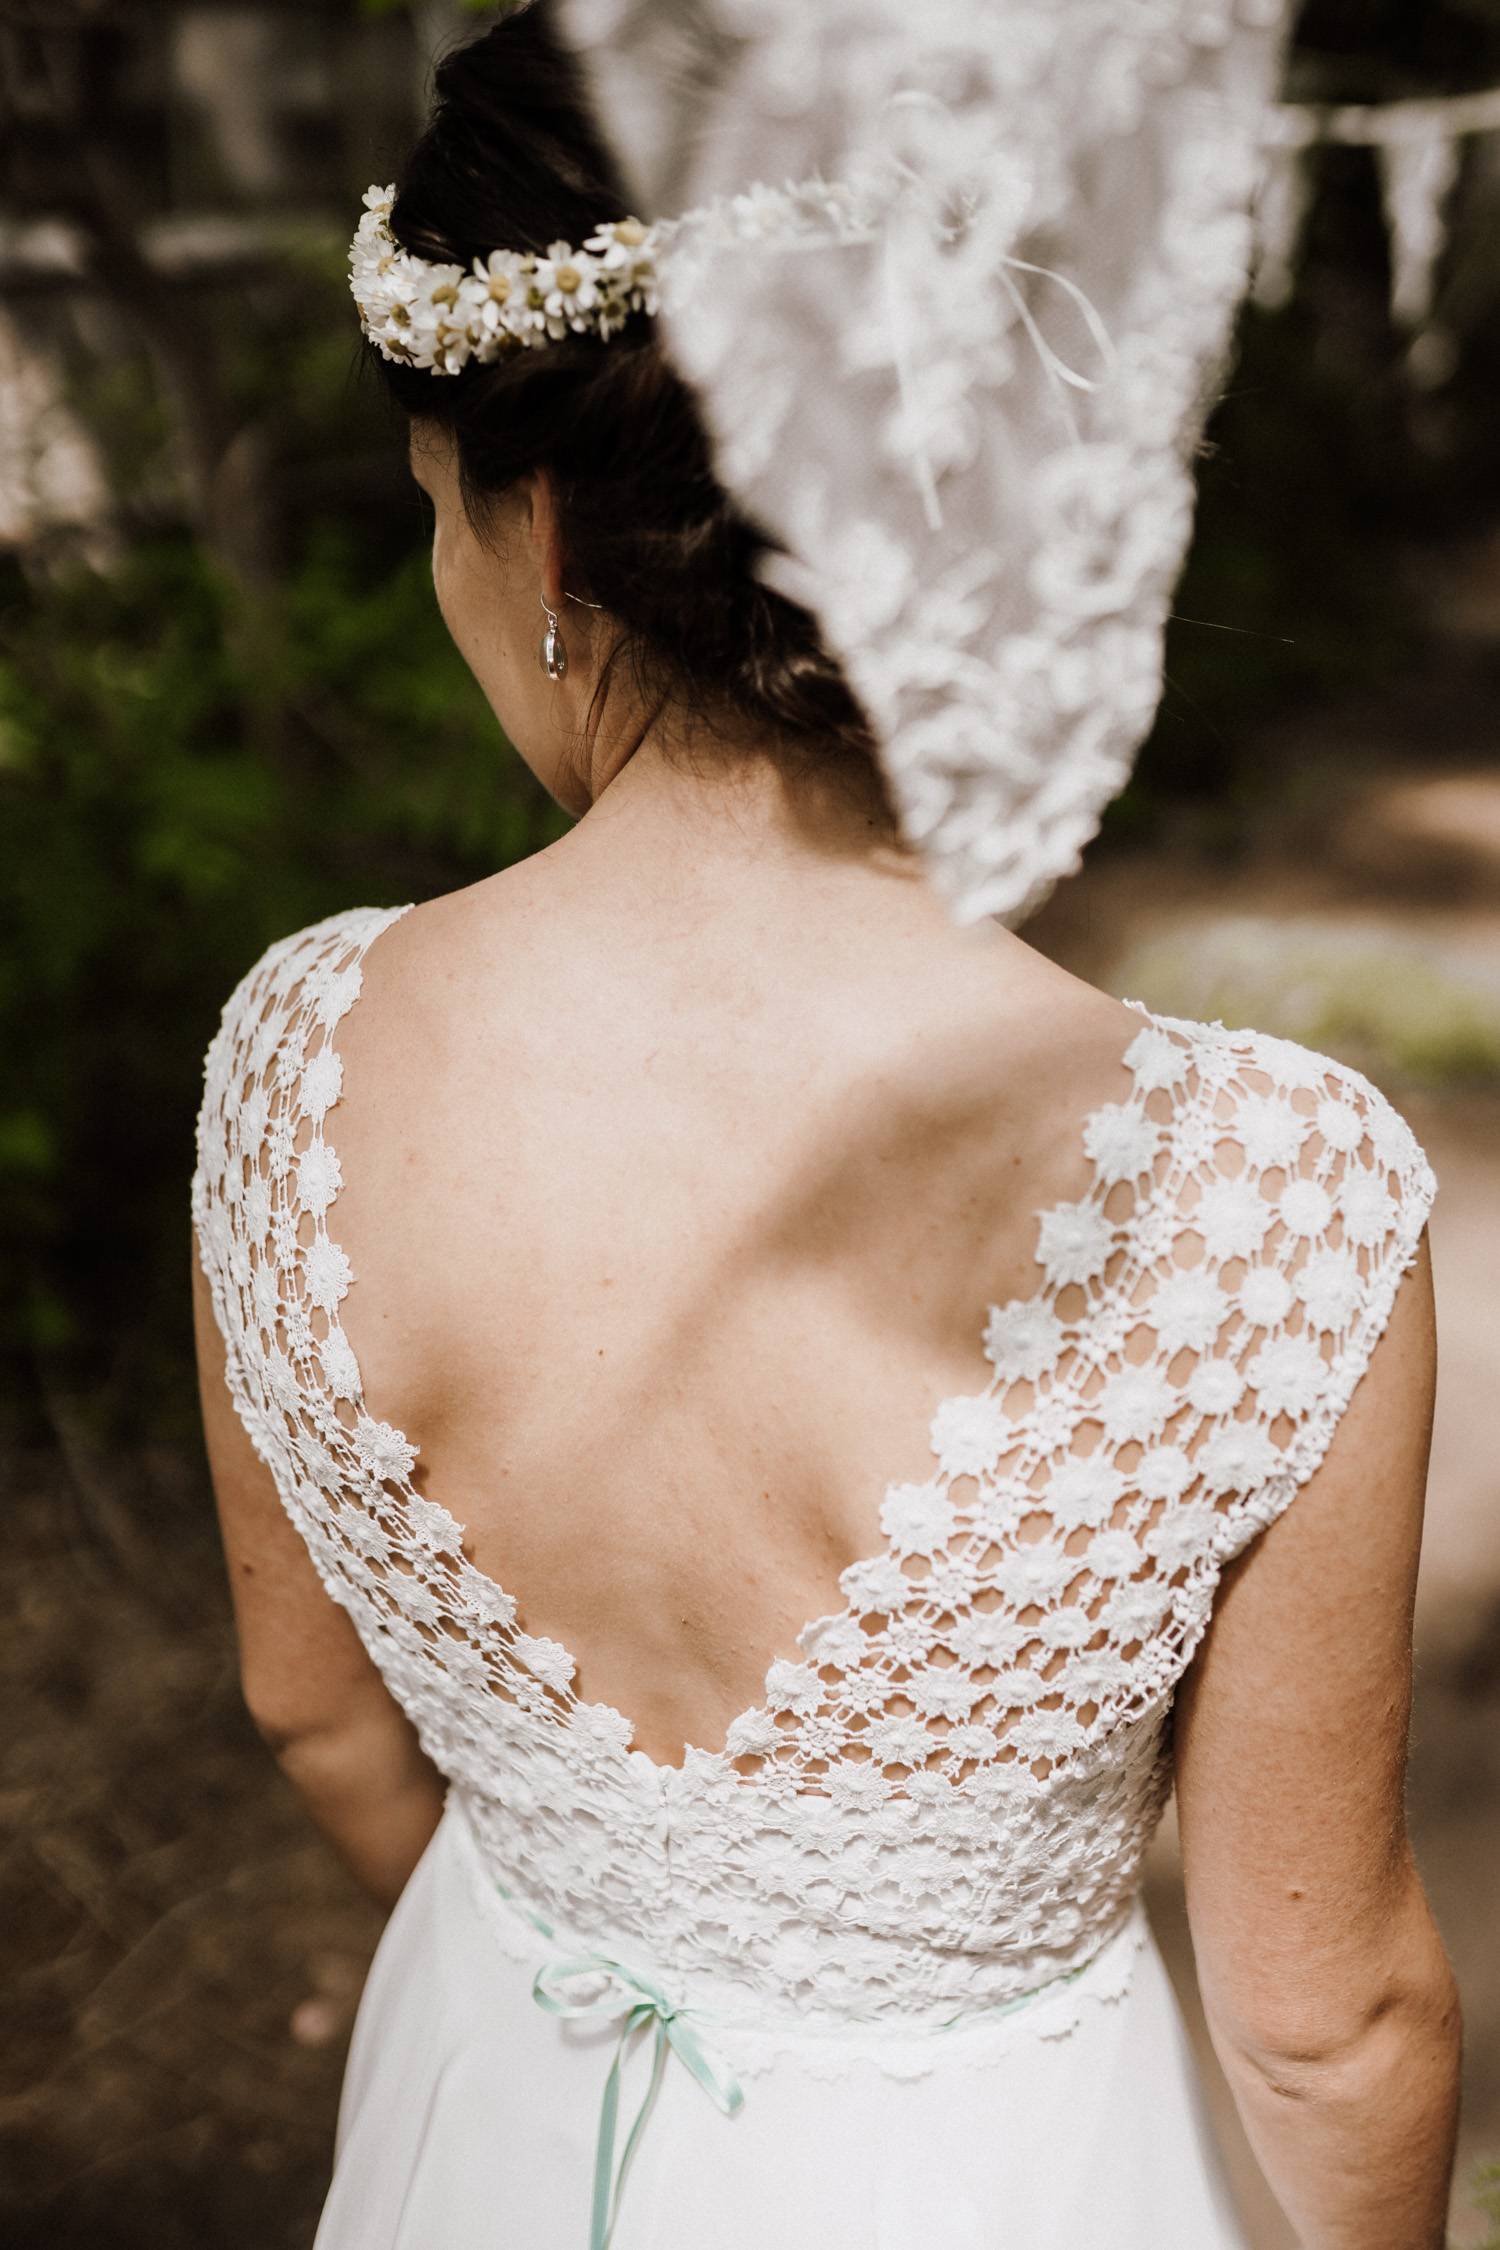 Brautkleid kurz rückenfrei, Brautkleid Standesamt kurz, Brautkleid Sommerhochzeit kurz, Brautkleid kurz, Brautkleid kurz Spitze